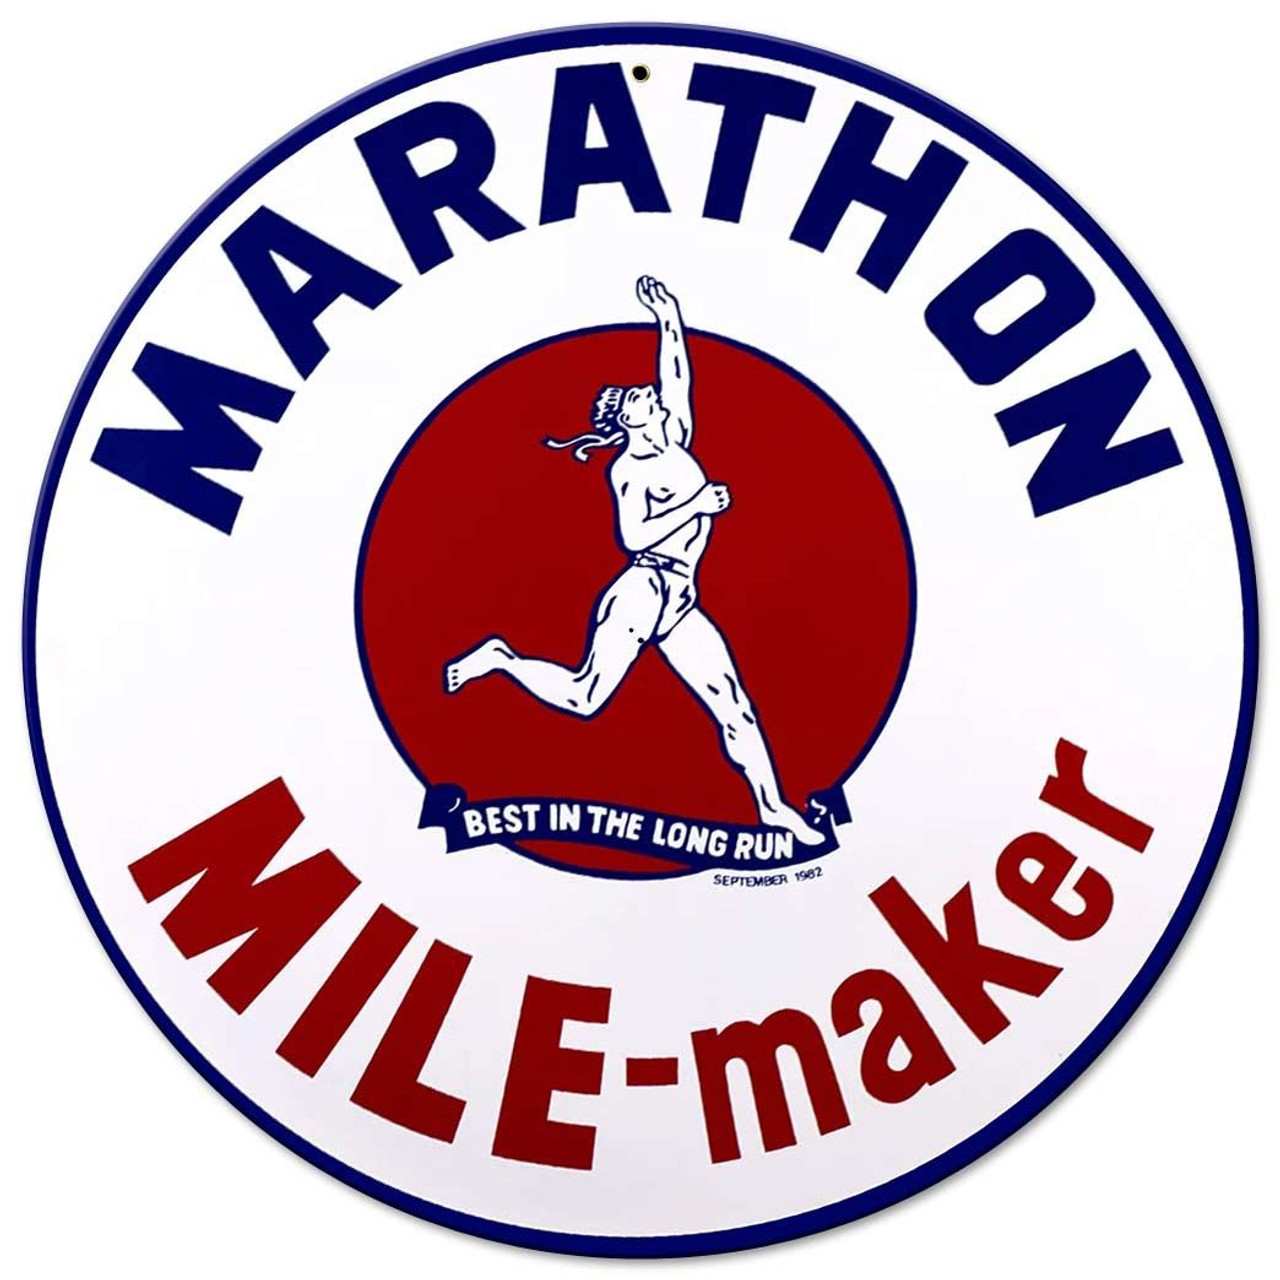 Marathon Metal Sign 14 x 14 Inches